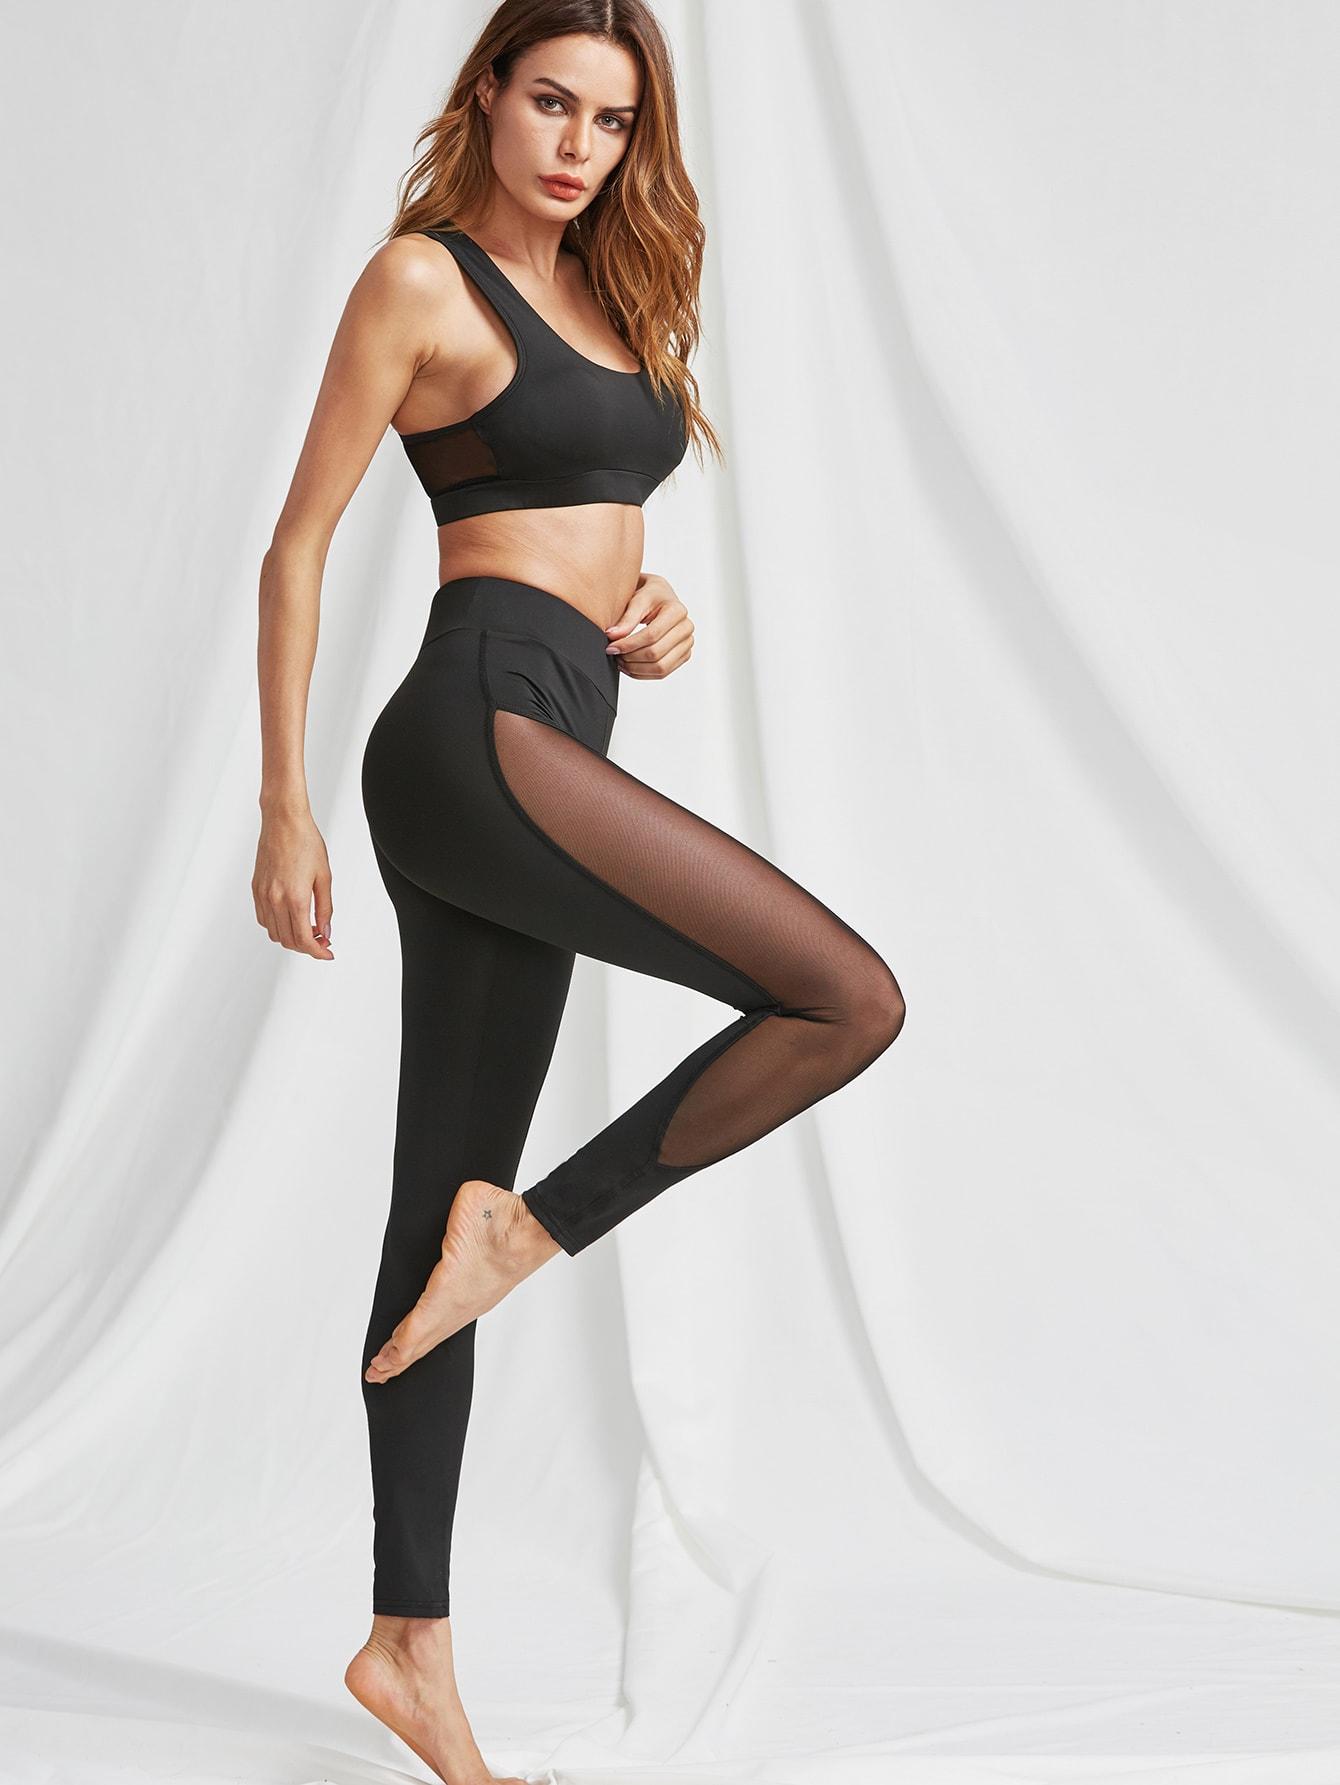 Mesh Panel Sports Bra And Leggings Activewear Set twopiece170422402